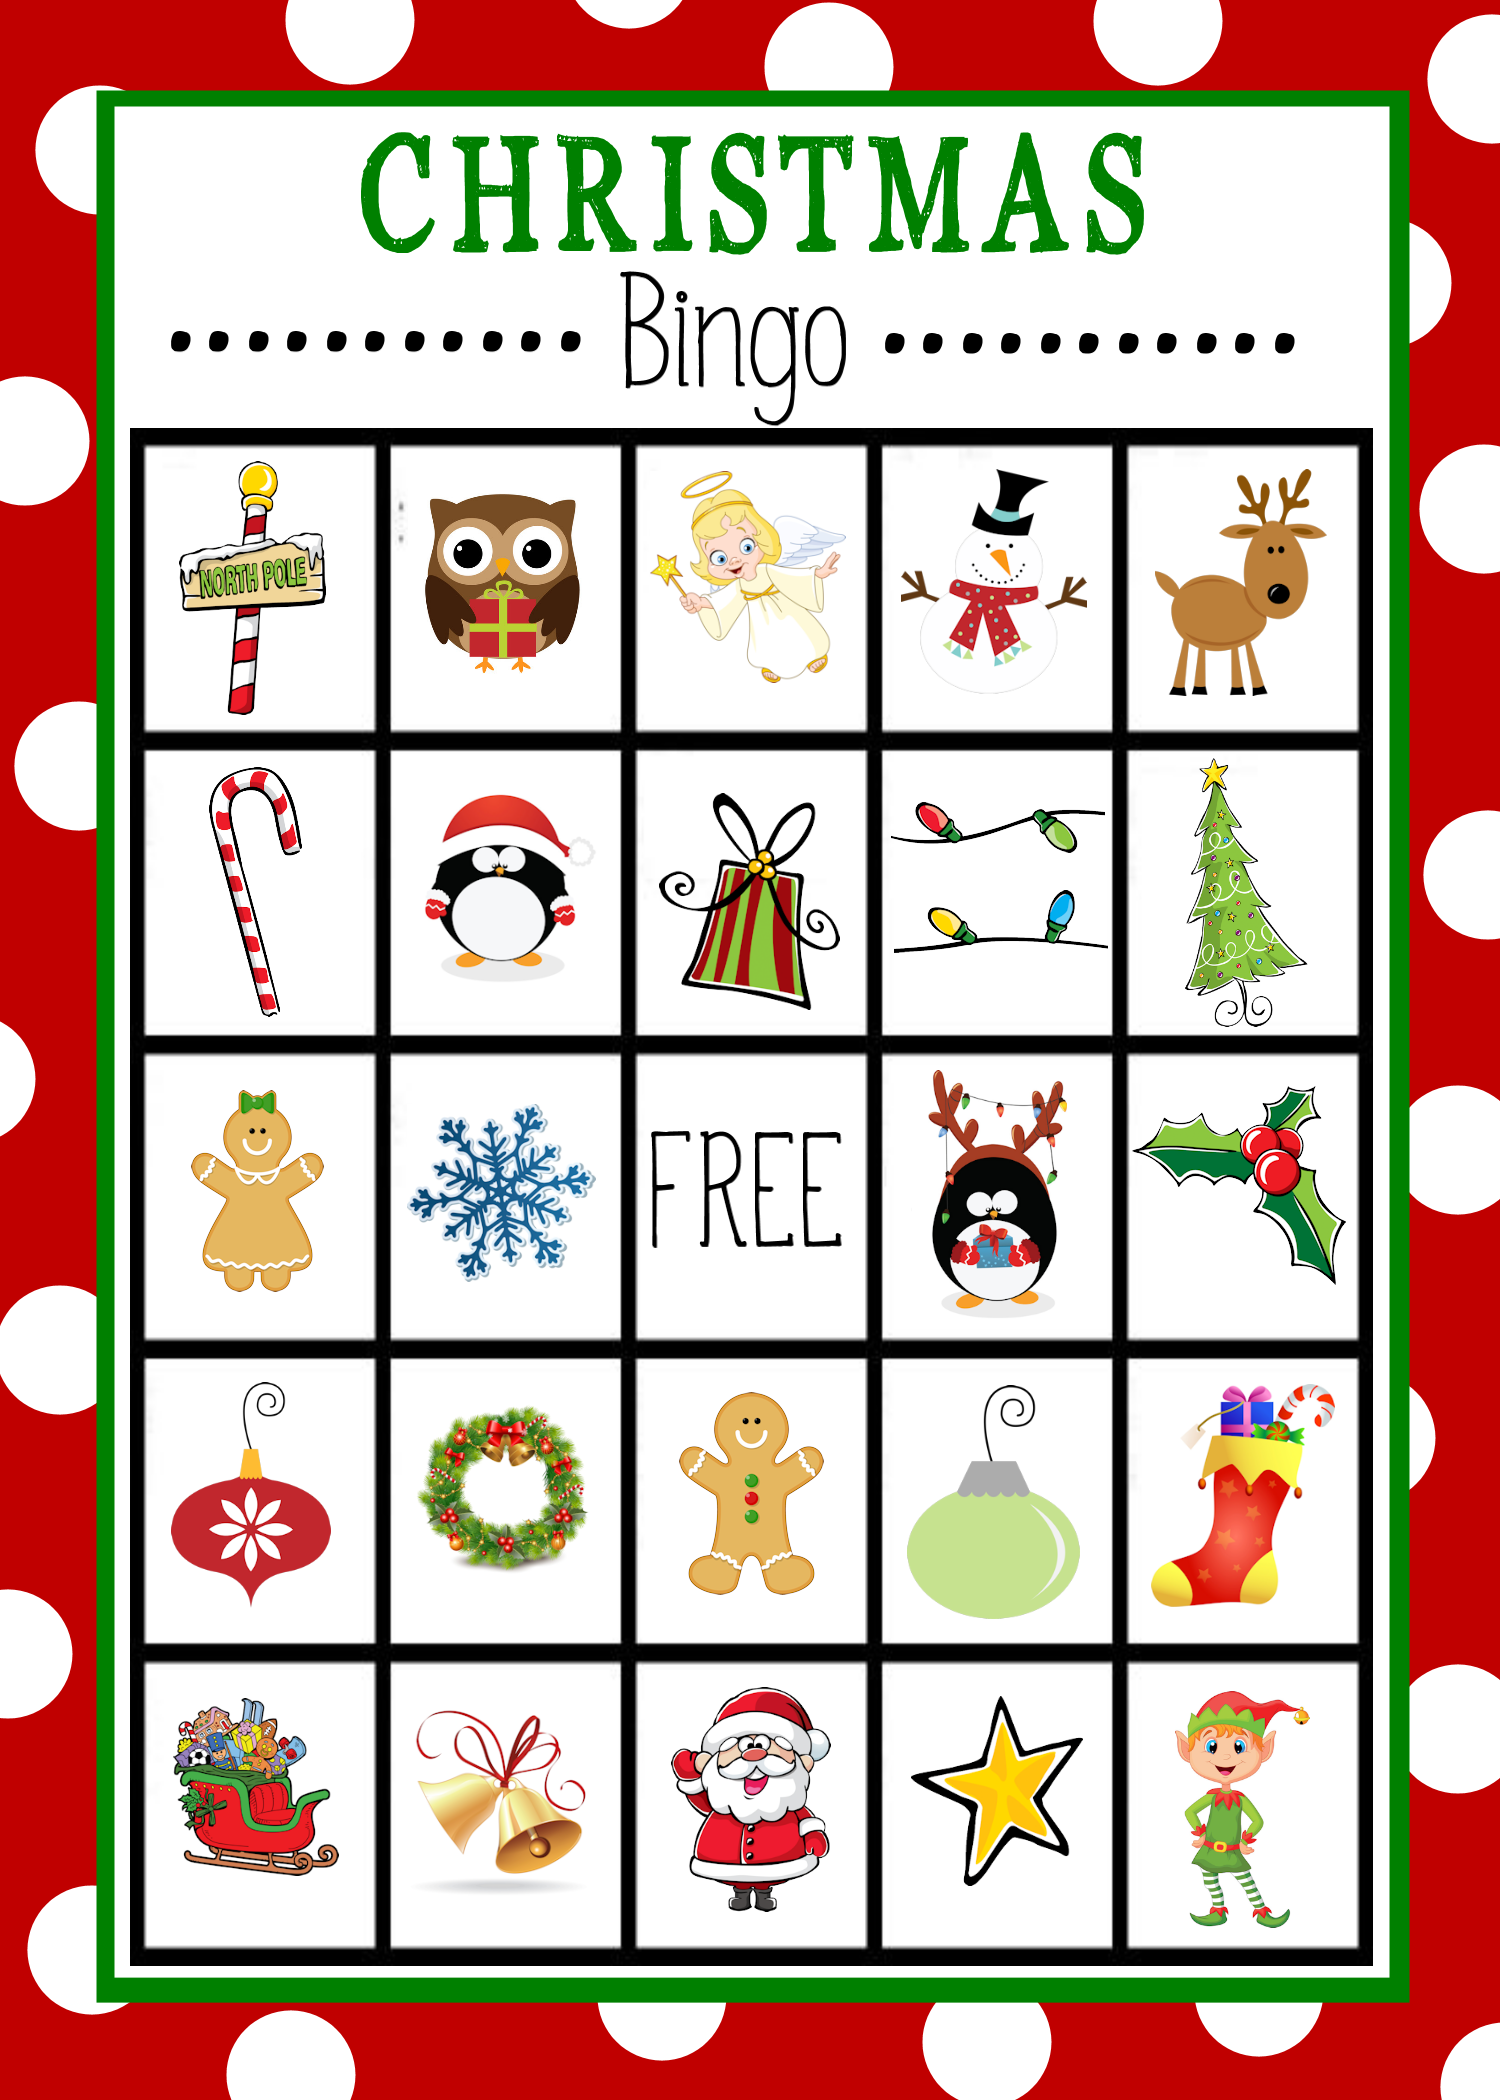 9 Images of Printable Christmas Bingo Boards